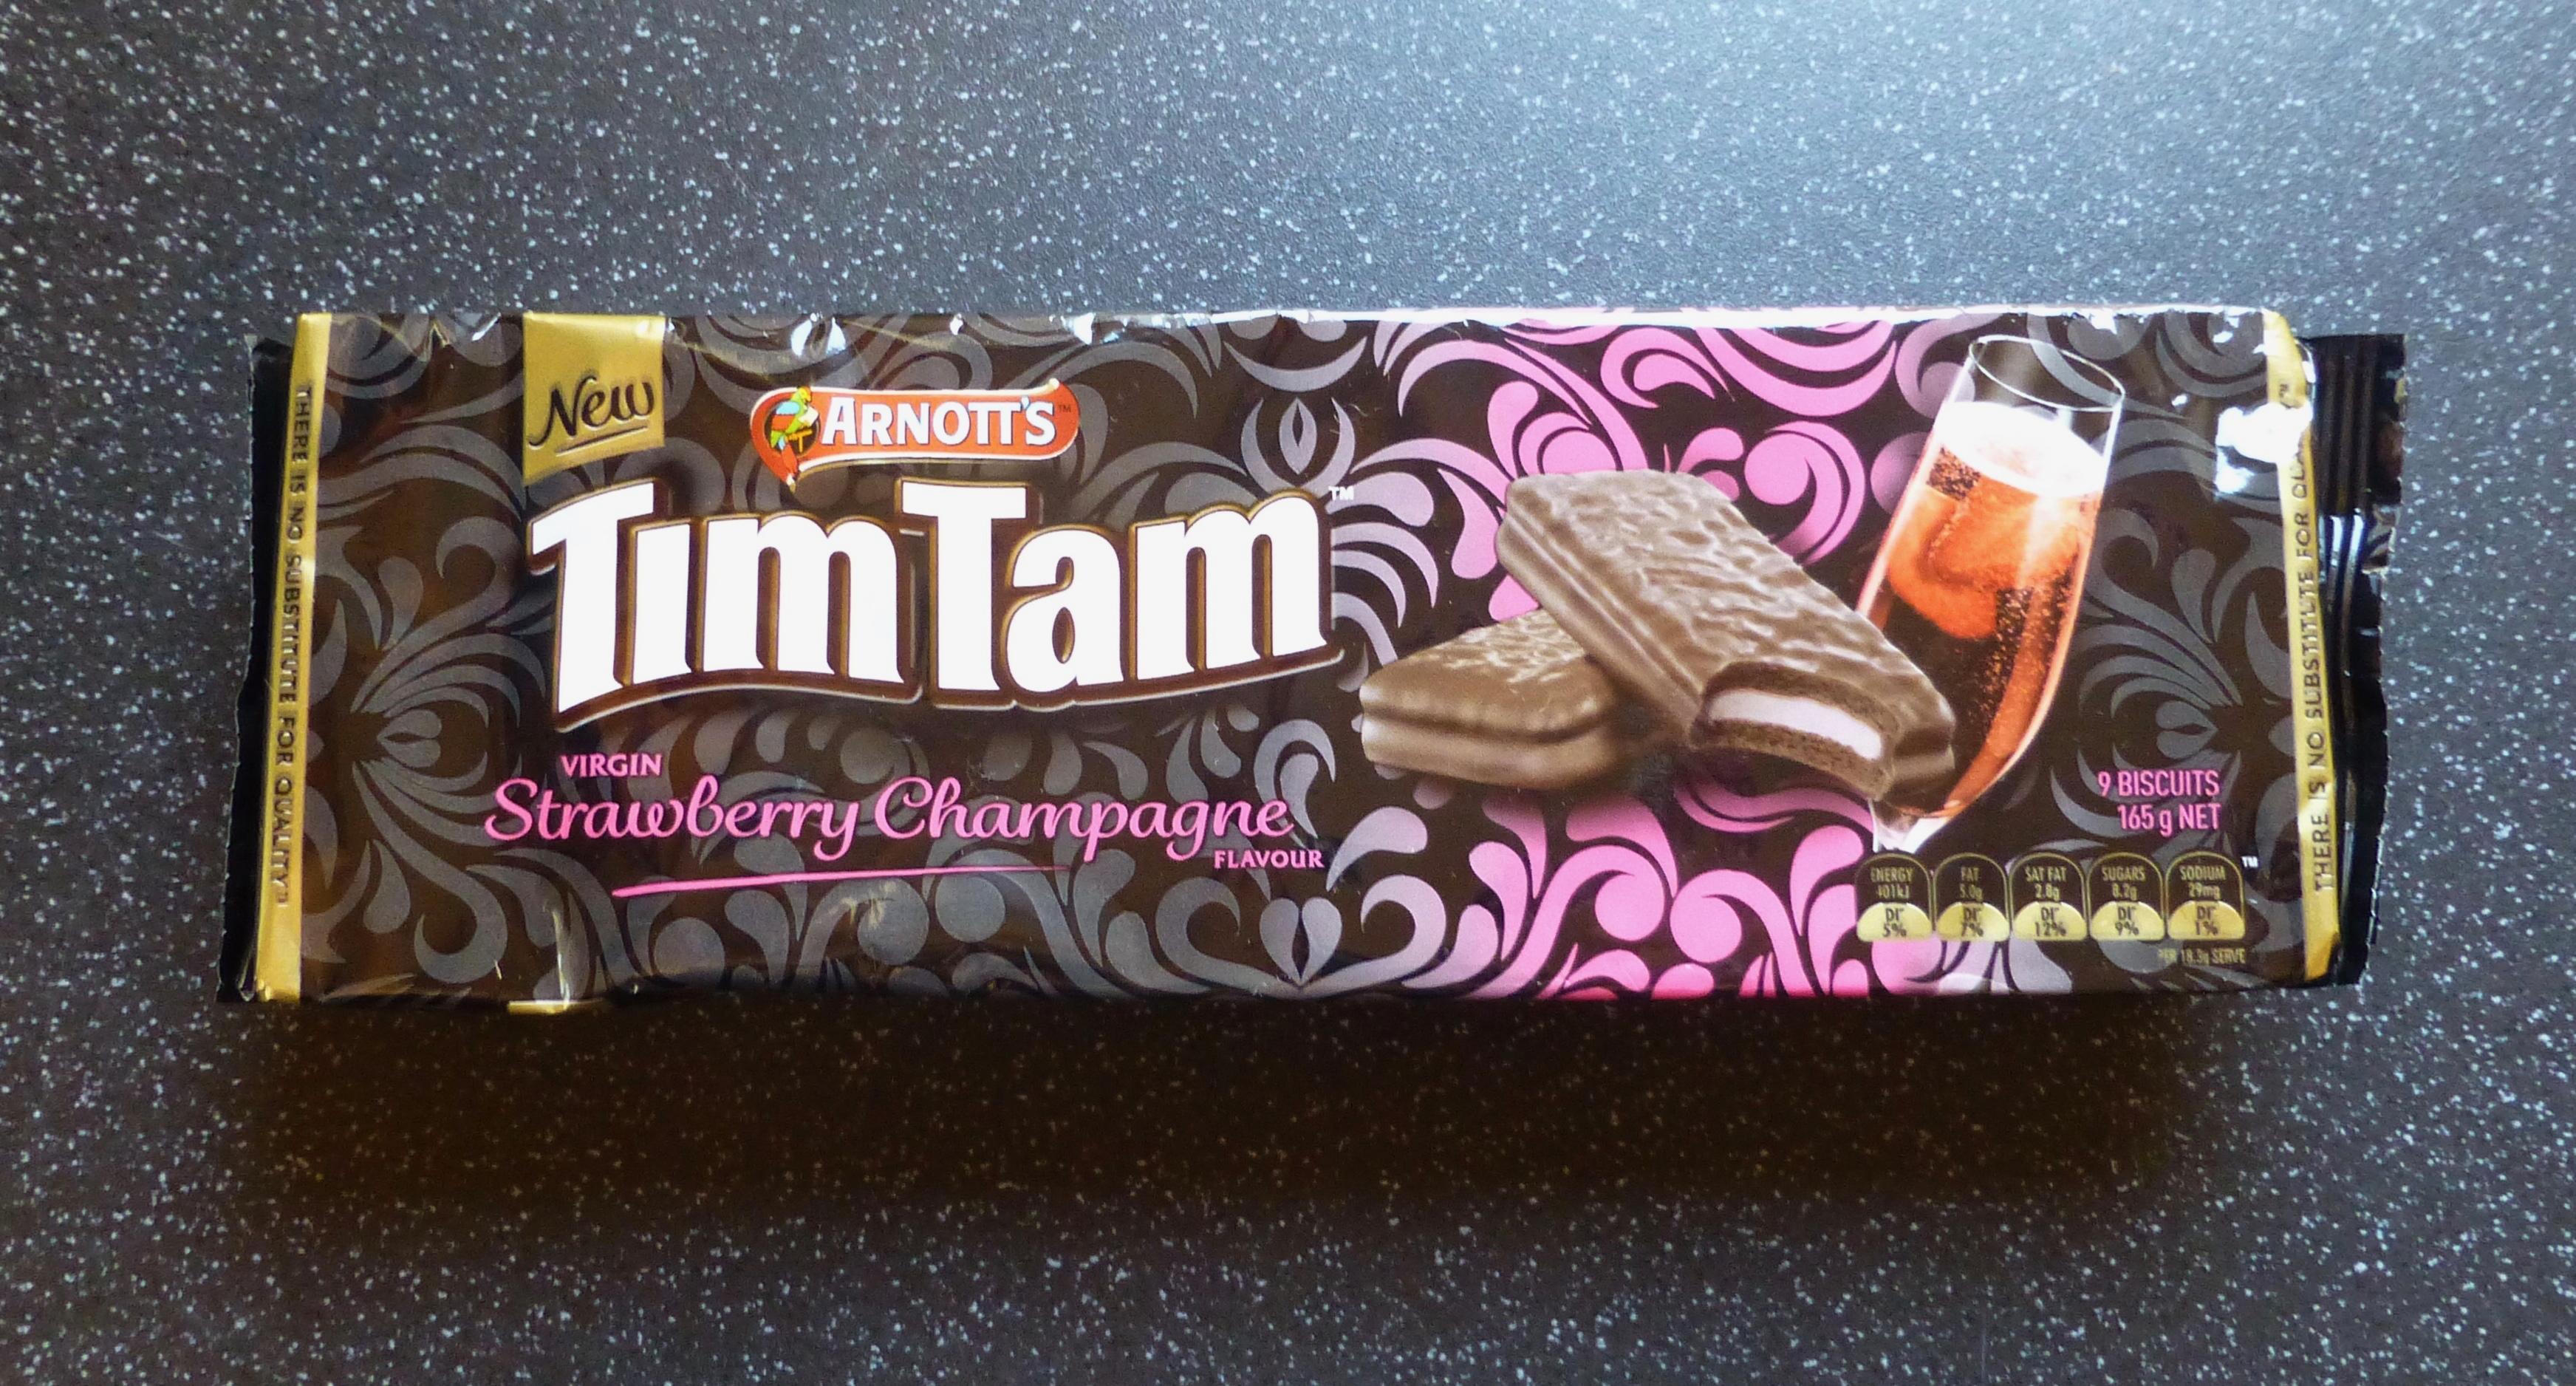 Tim Tam Strawberry Champagne